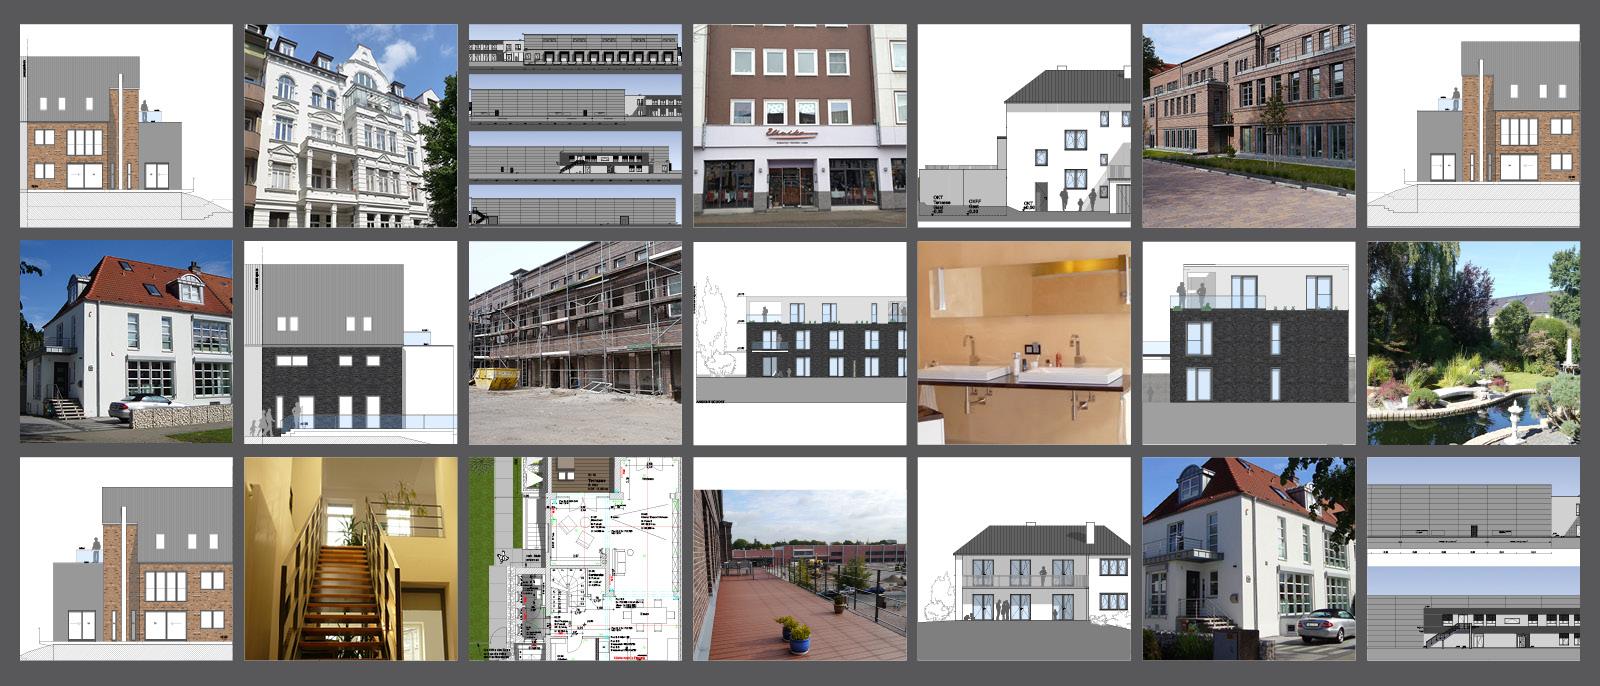 Startseite_Collage_v2.jpg